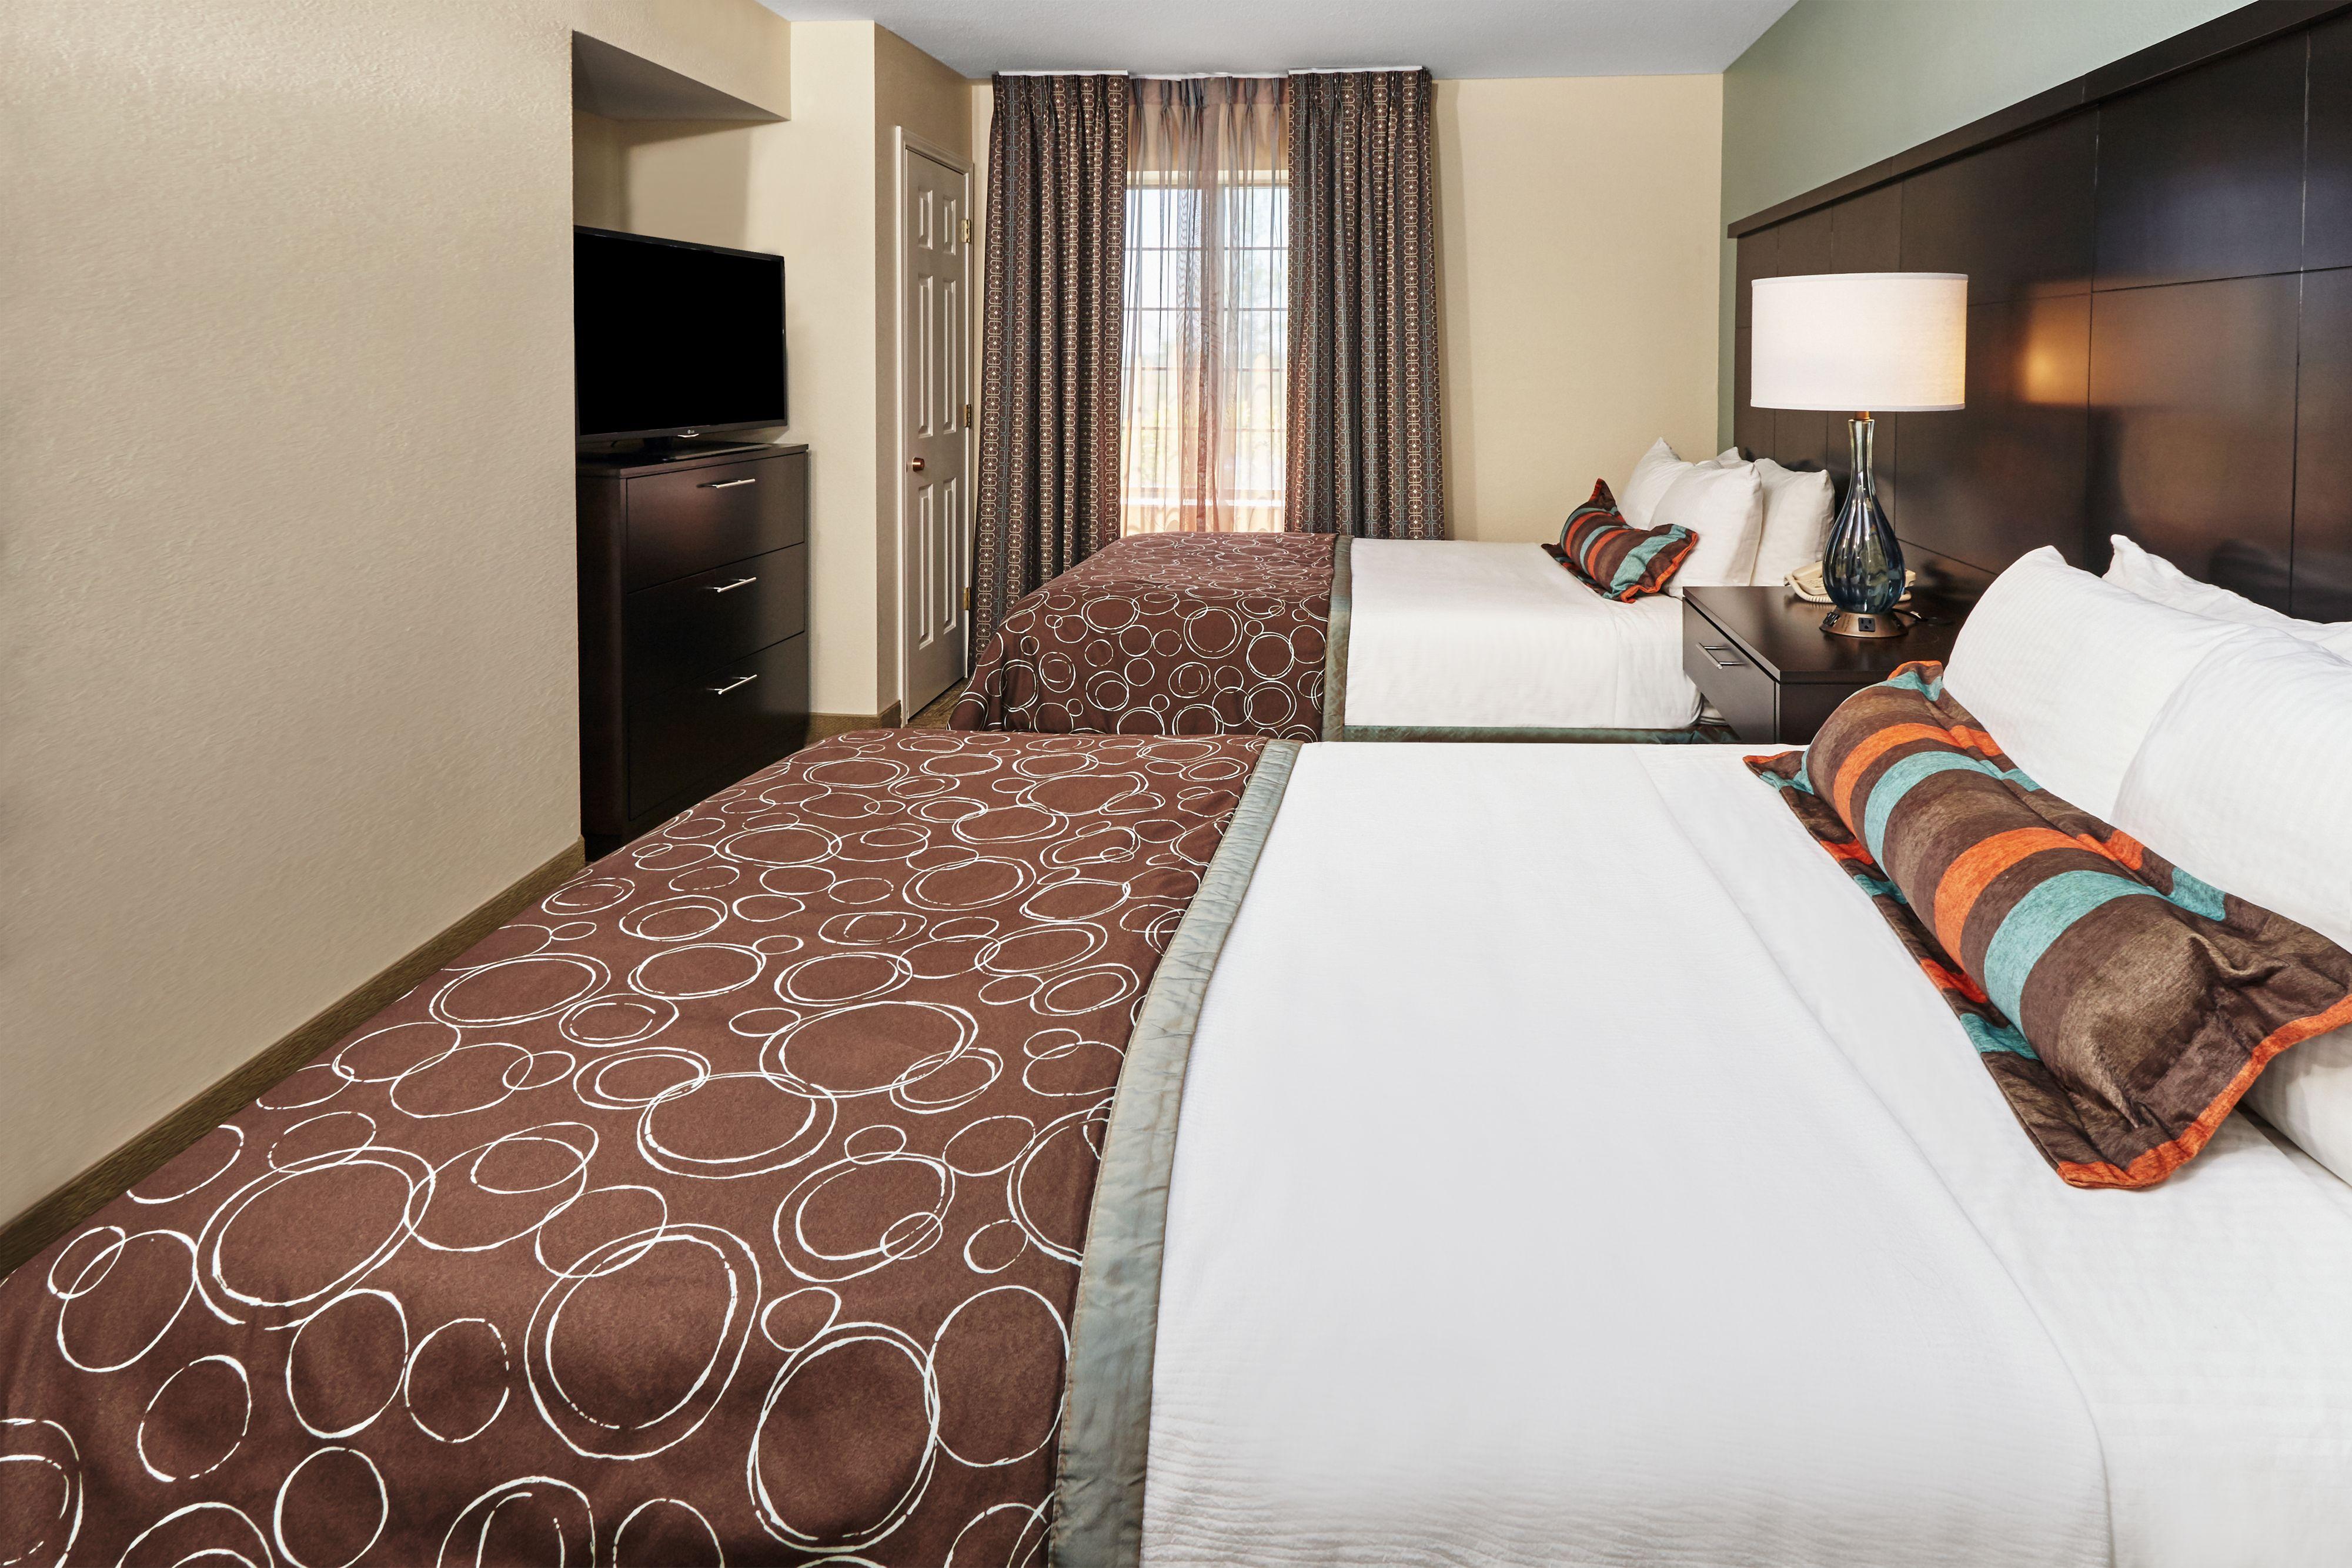 staybridge-suites-lincolnshire-4323935827-original.jpg